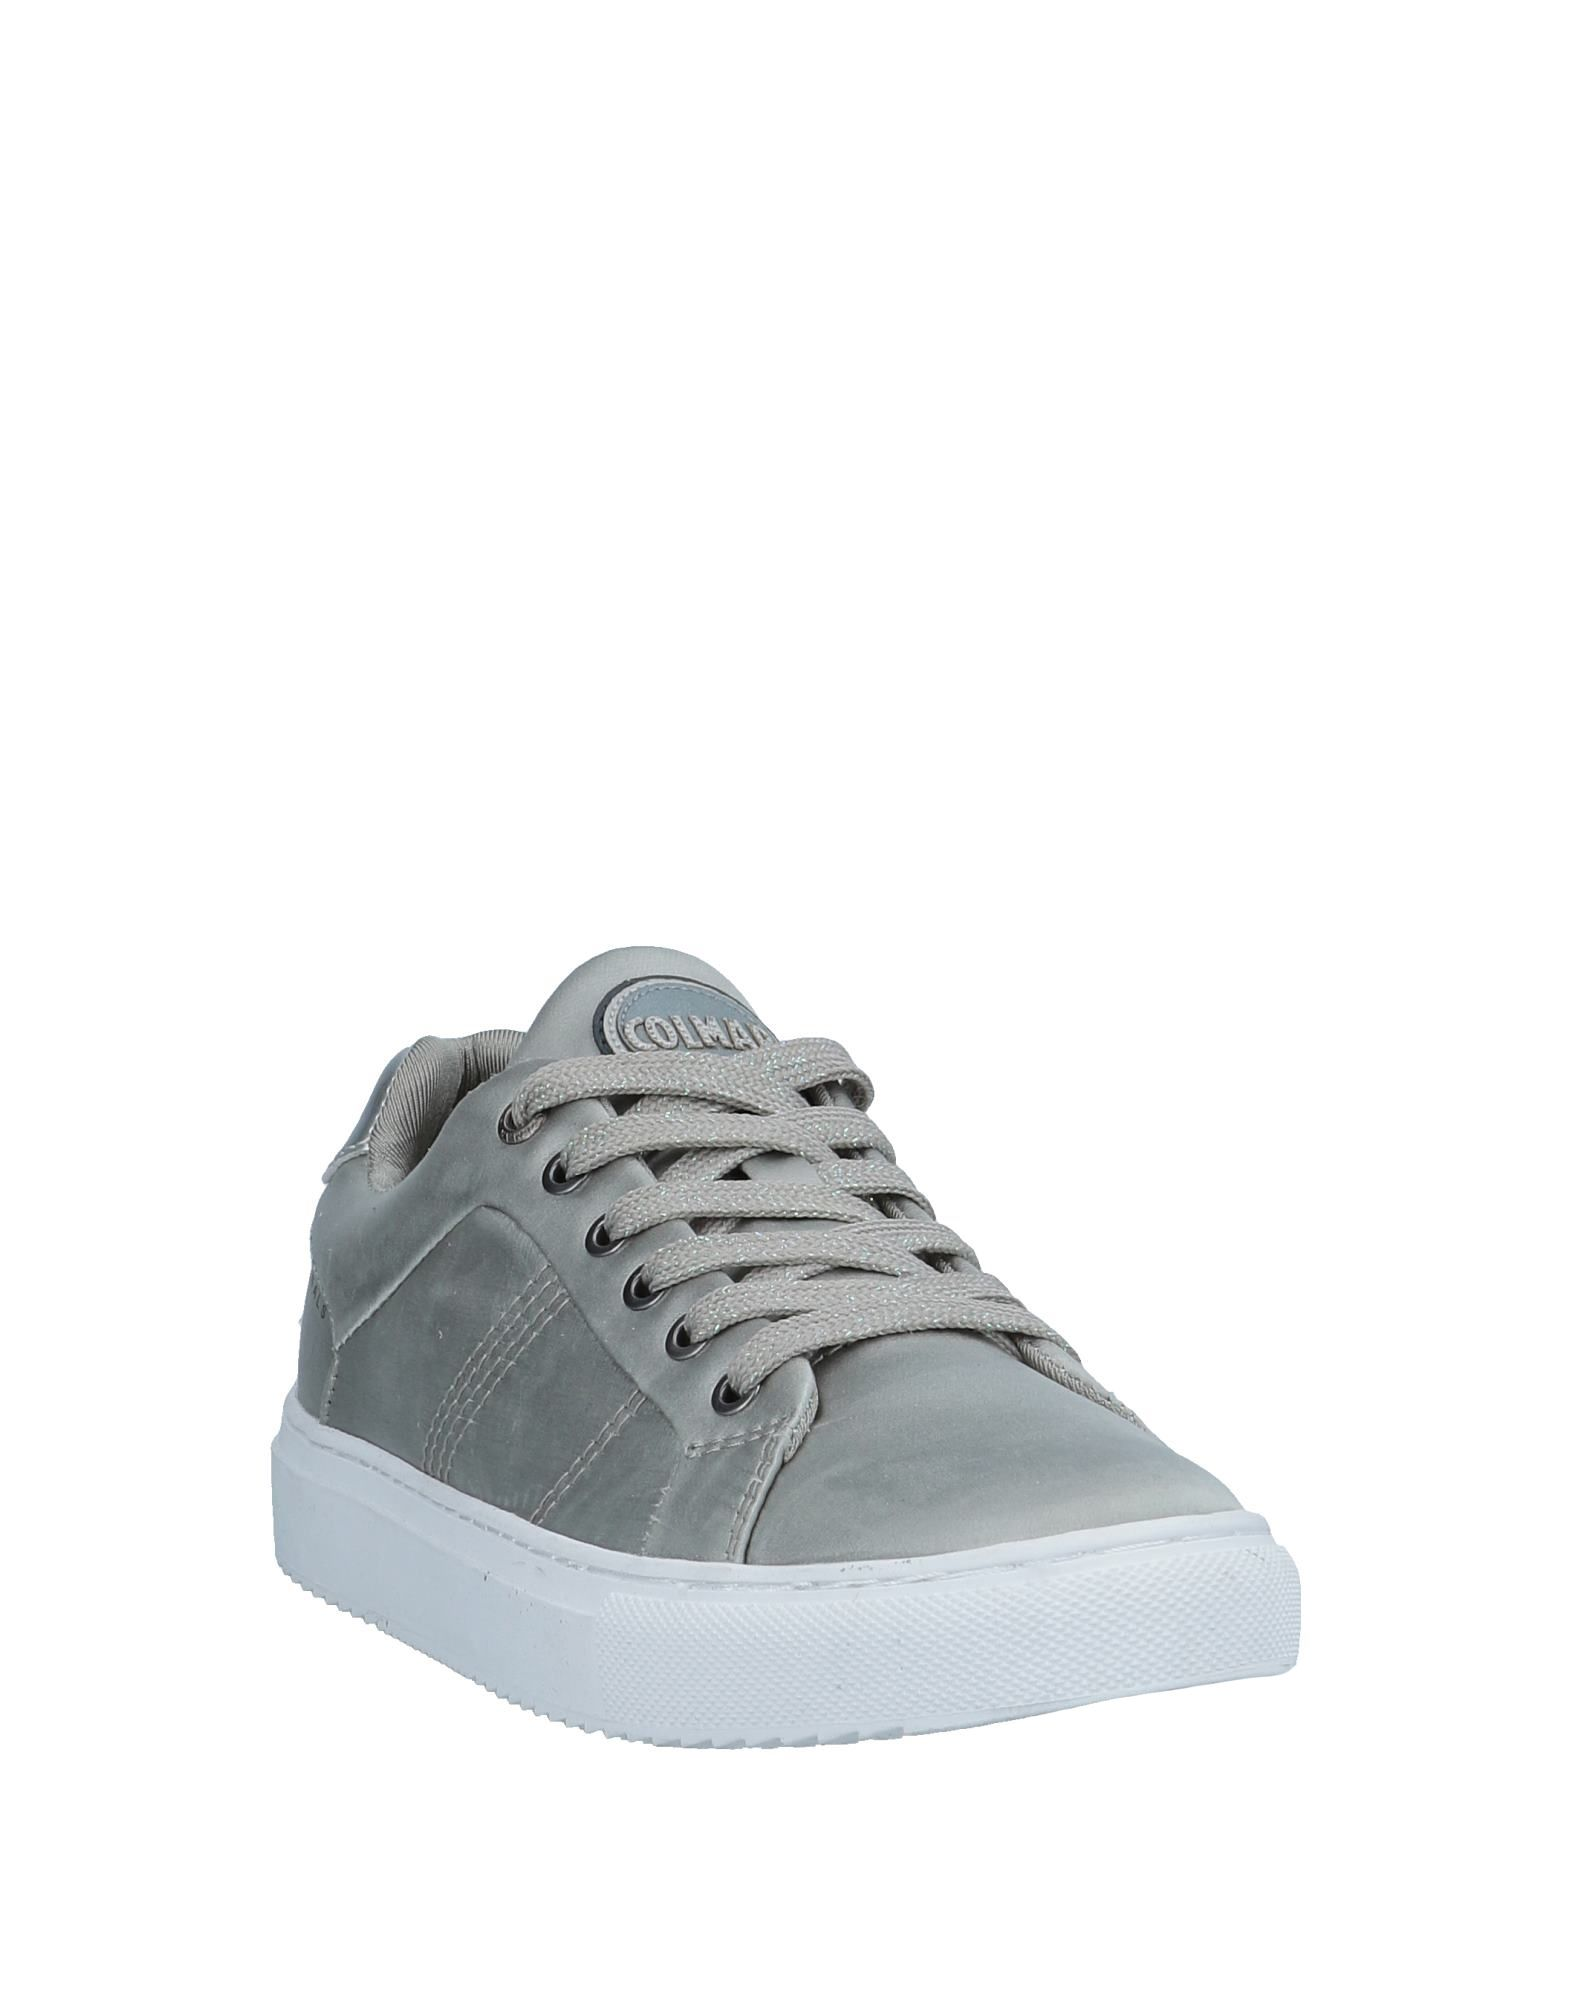 Colmar Gute Sneakers Damen  11553378KH Gute Colmar Qualität beliebte Schuhe 3cbf66